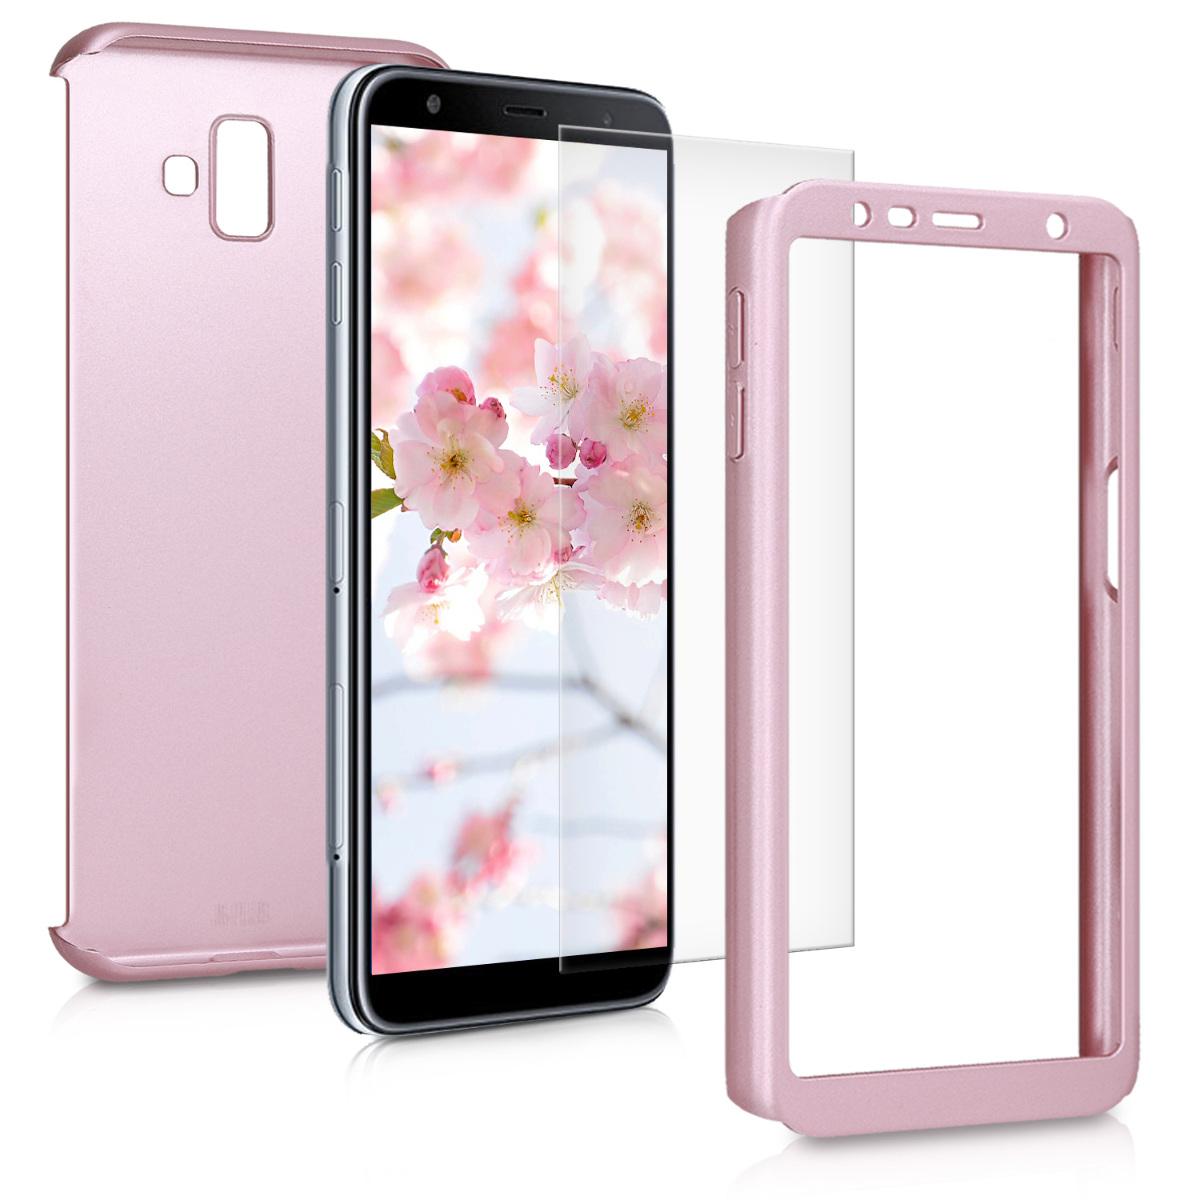 KW Θήκη Full Body with Screen Protector - Samsung Galaxy J6 Plus - Metallic Rose Gold (46445.31)